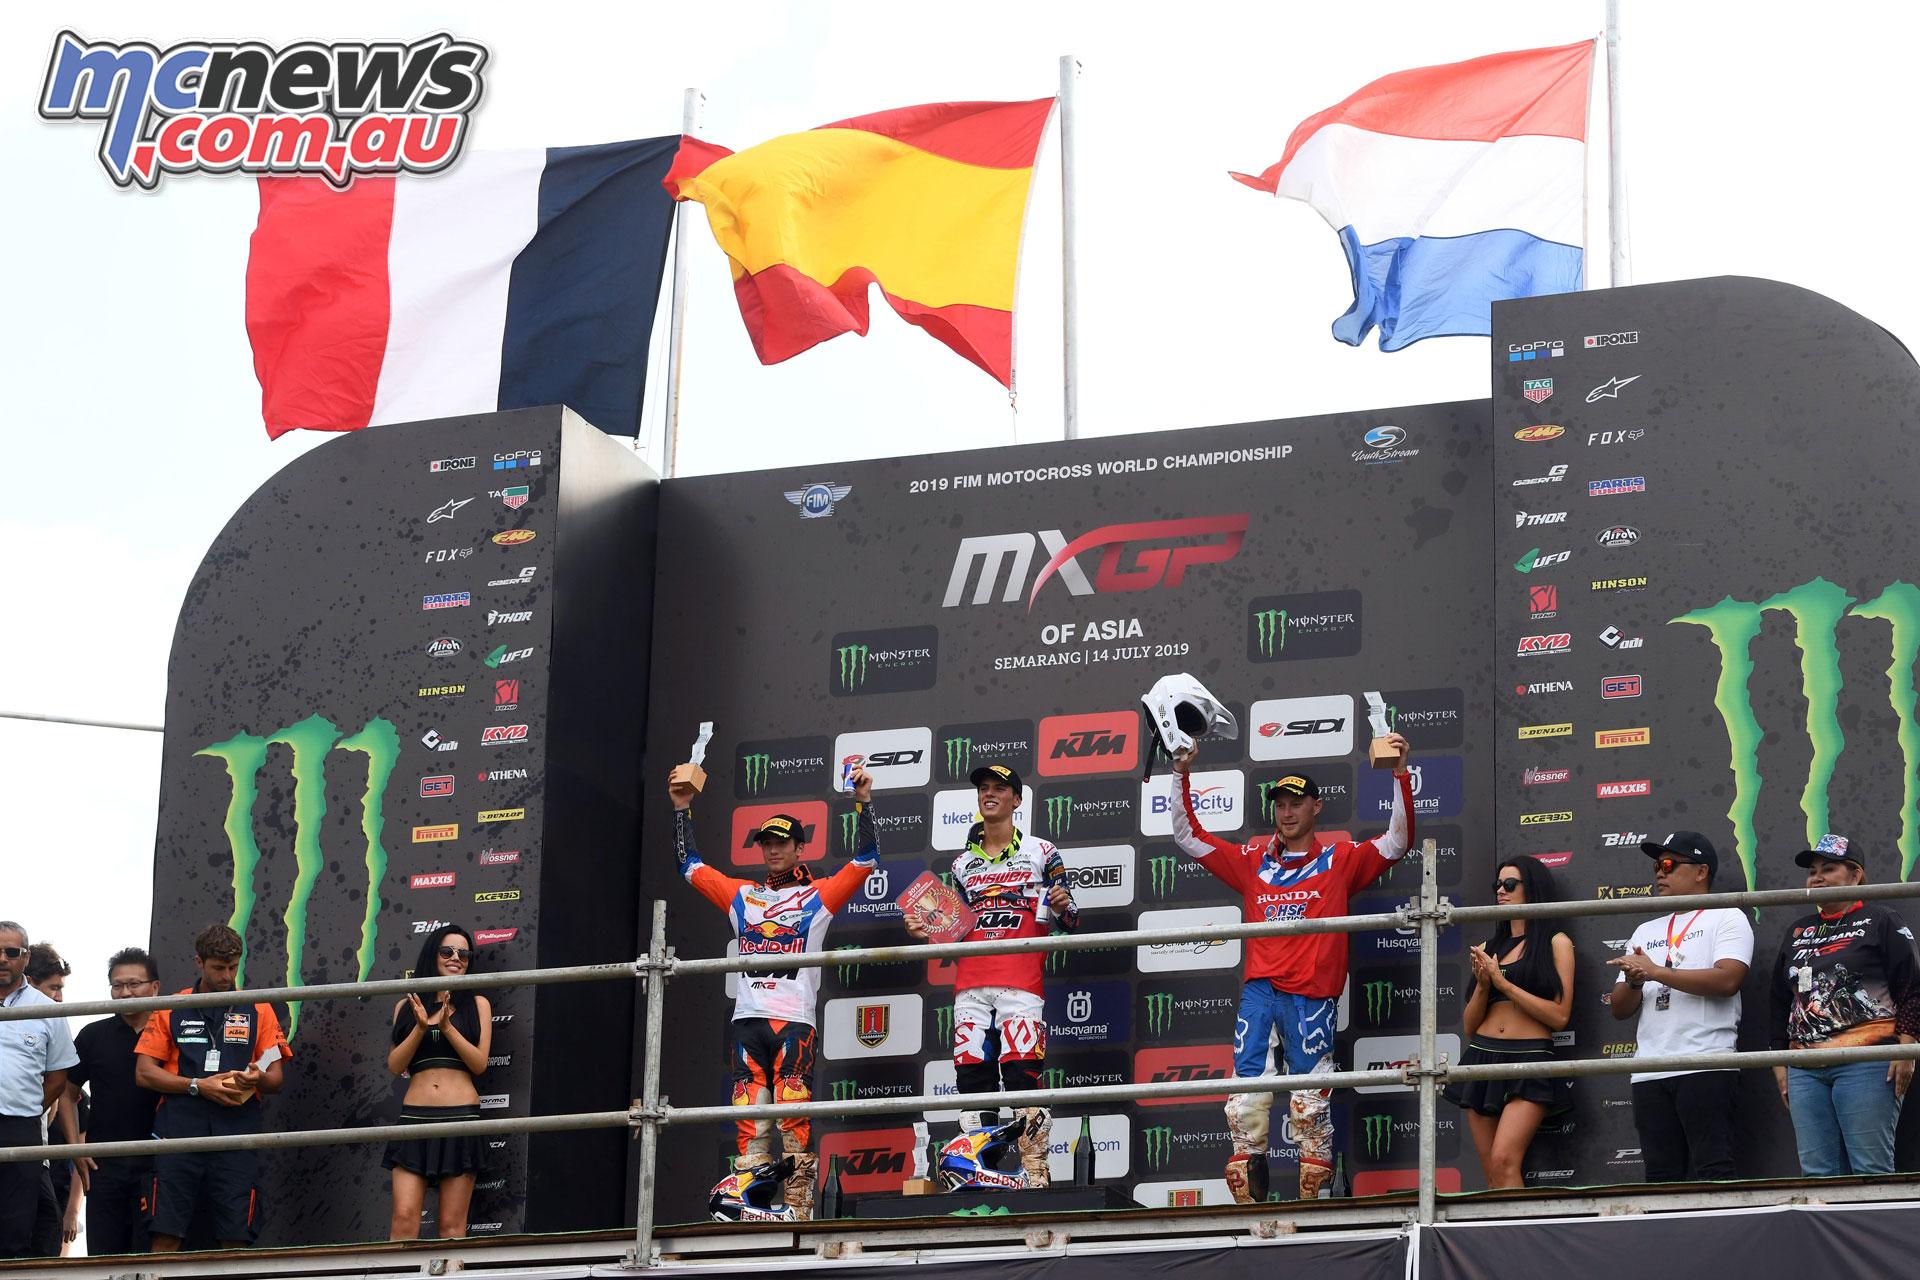 MXGP Asia Semarang Rnd Prado podium